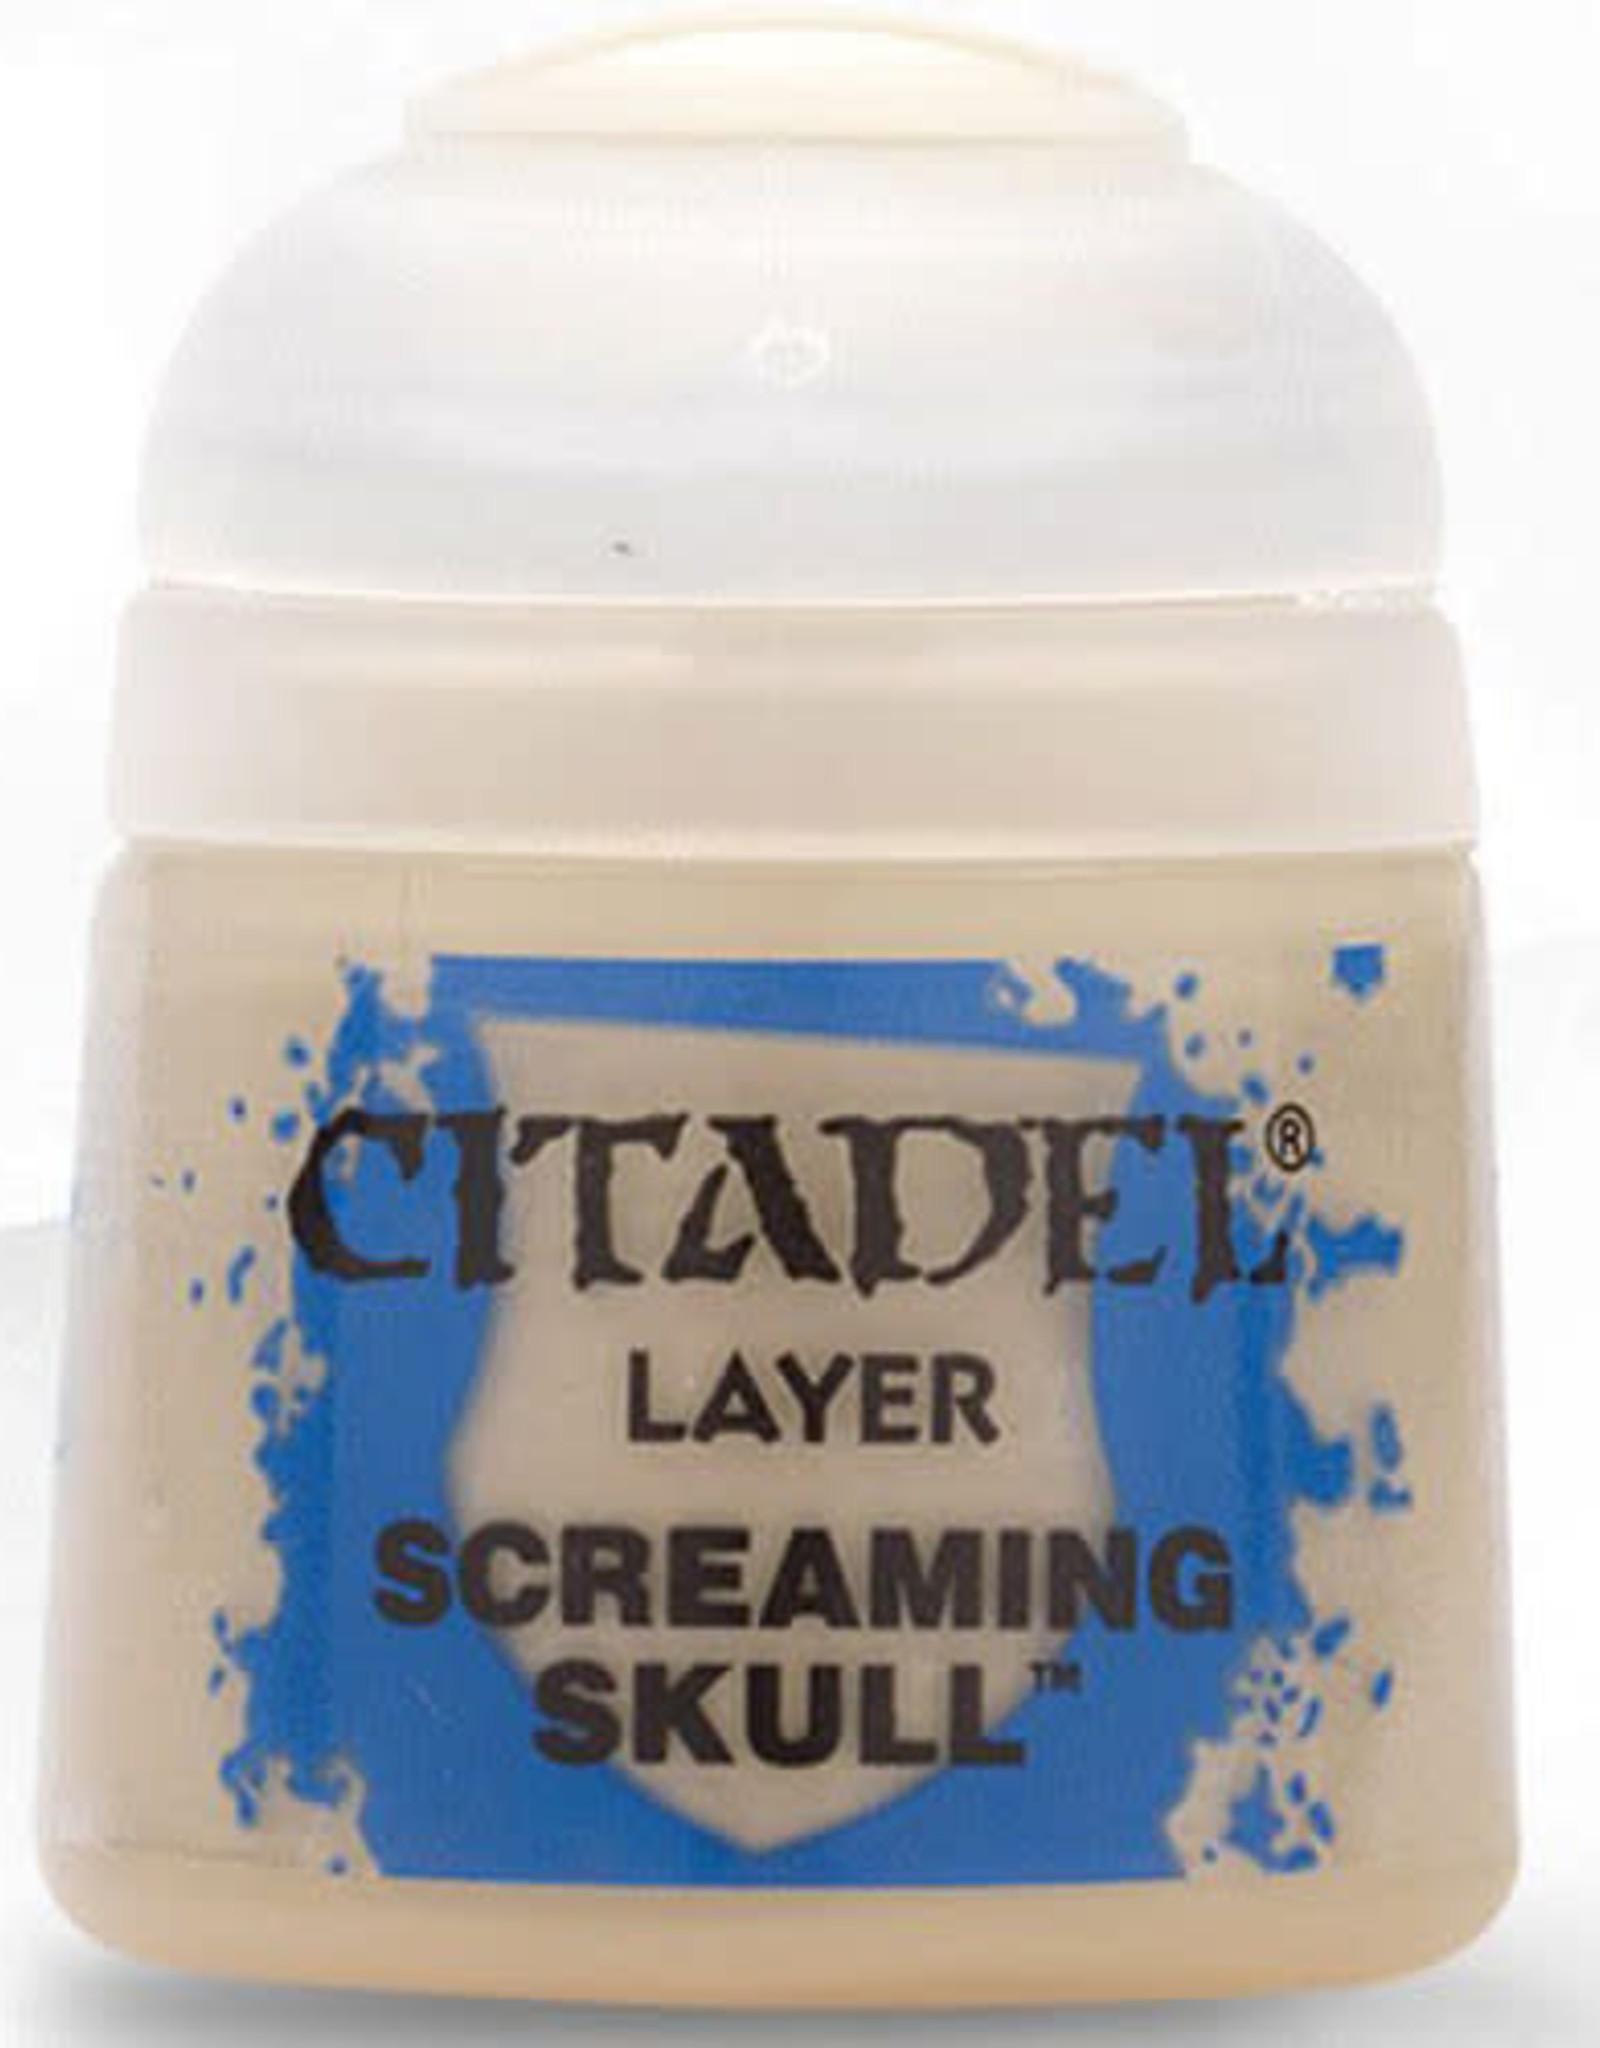 Citadel Layer Paint: Screaming Skull (12ml)